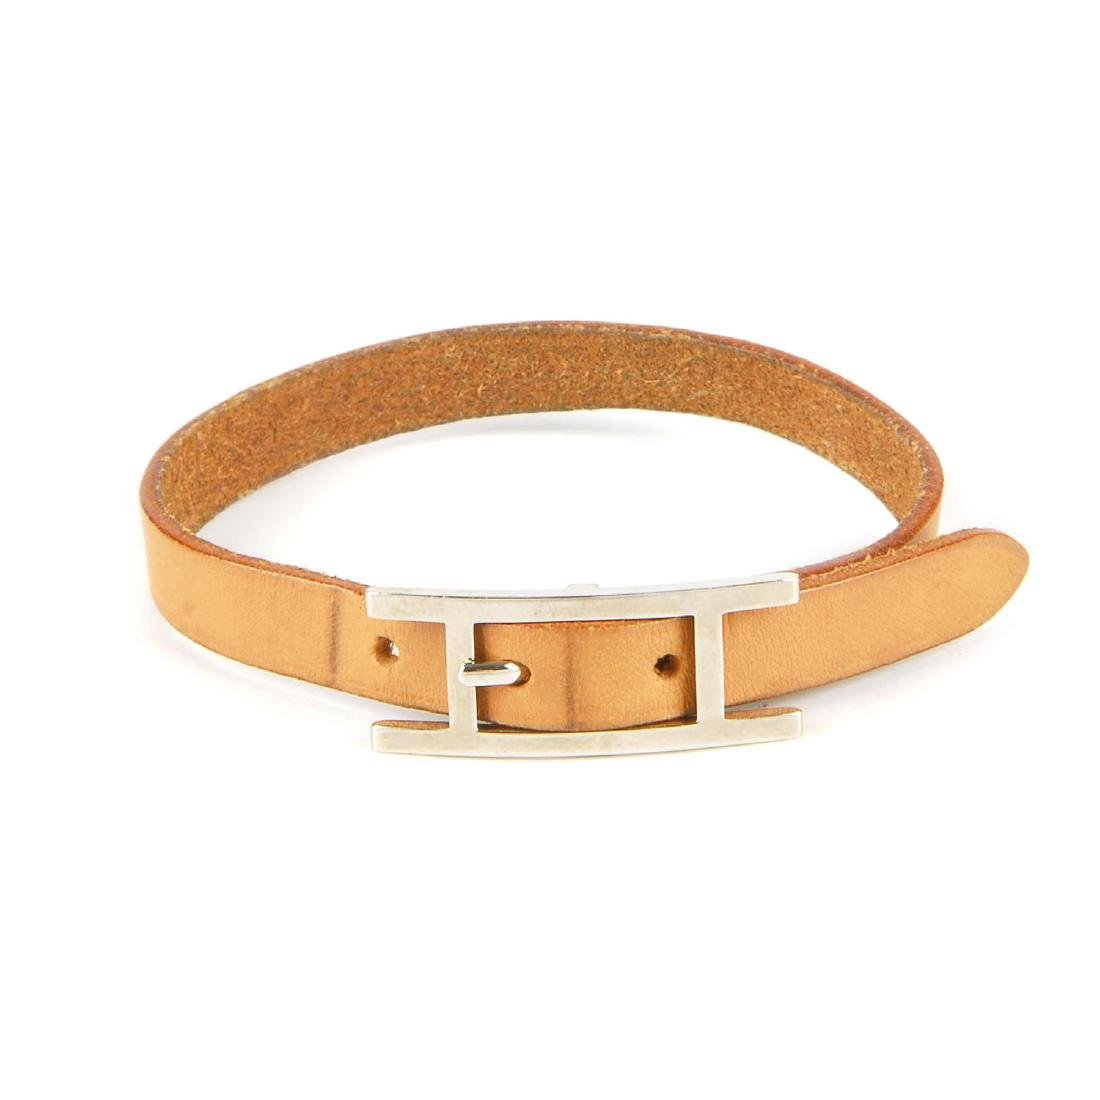 HERMÈS - a leather bracelet. Designed as a tan leather